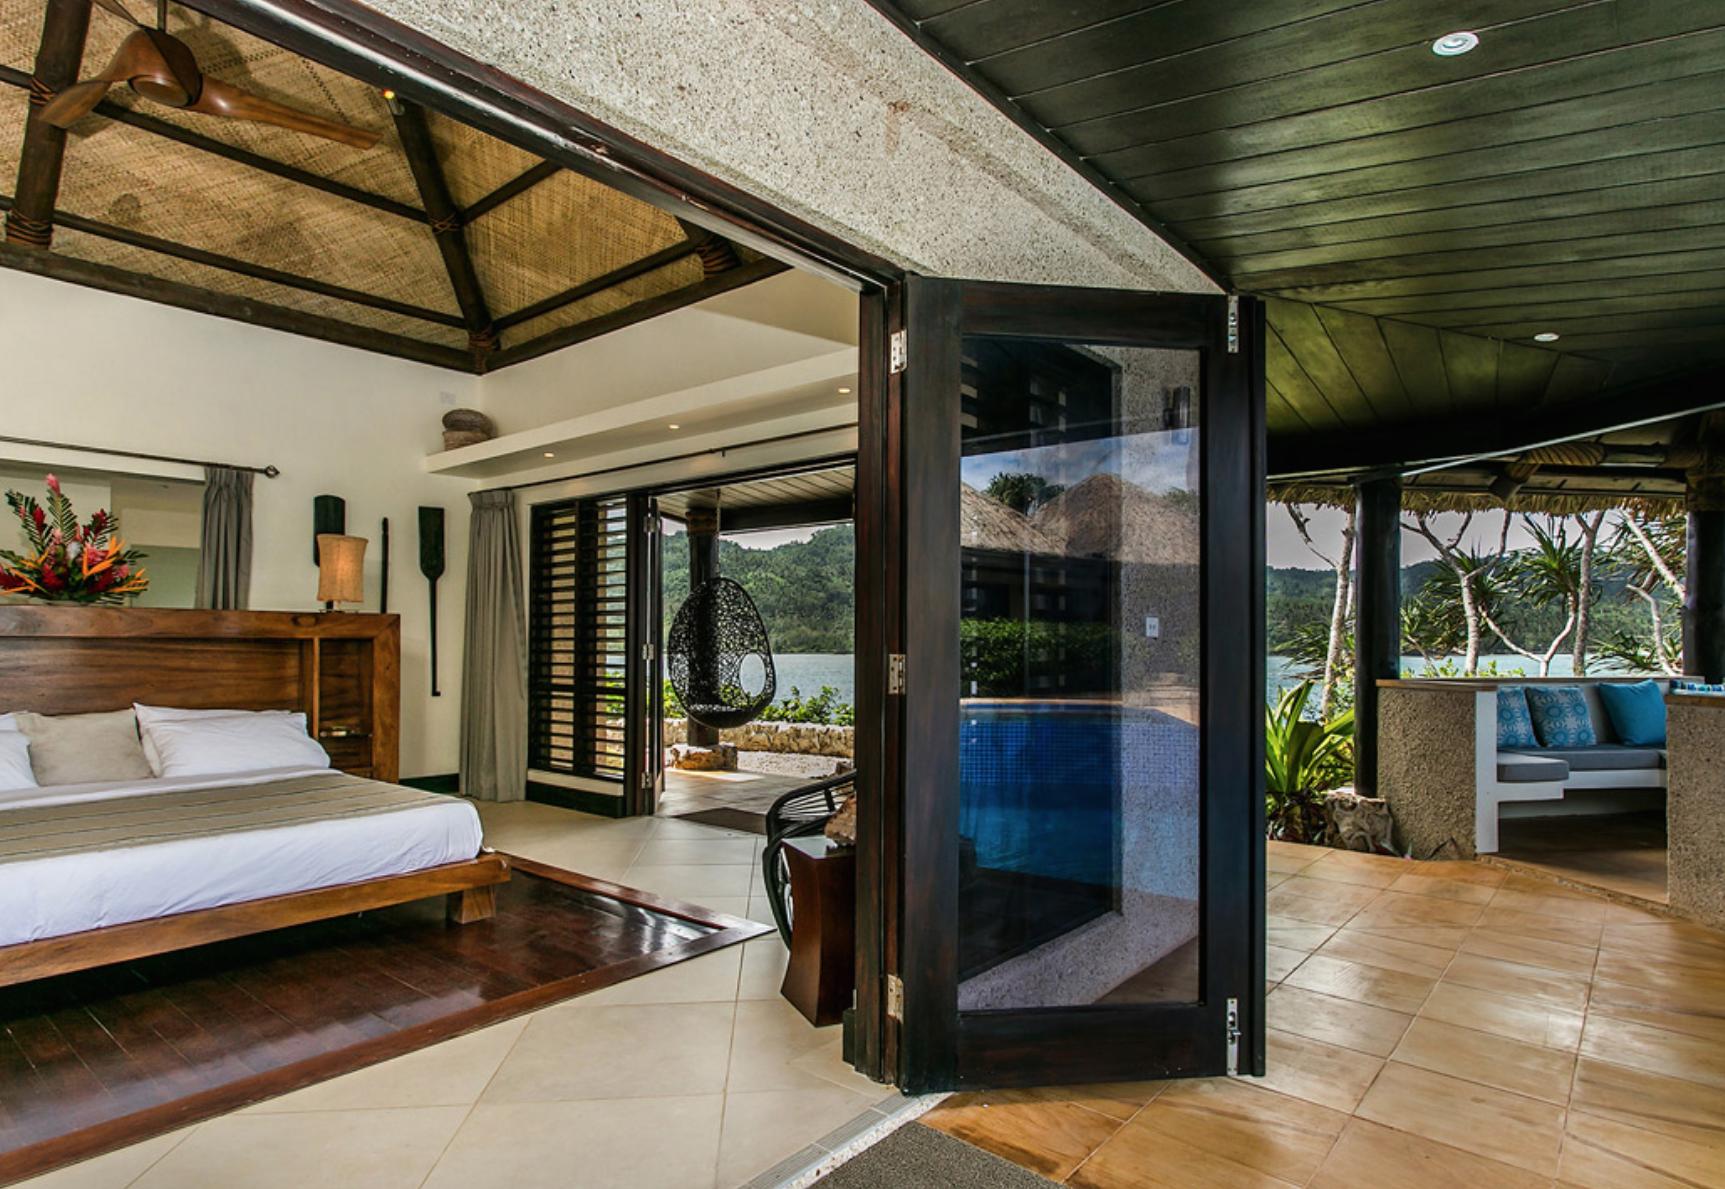 Got Crypto? Bitcoin, XRP and Ethereum Buys Lavish Oceanfront Villa in Fiji